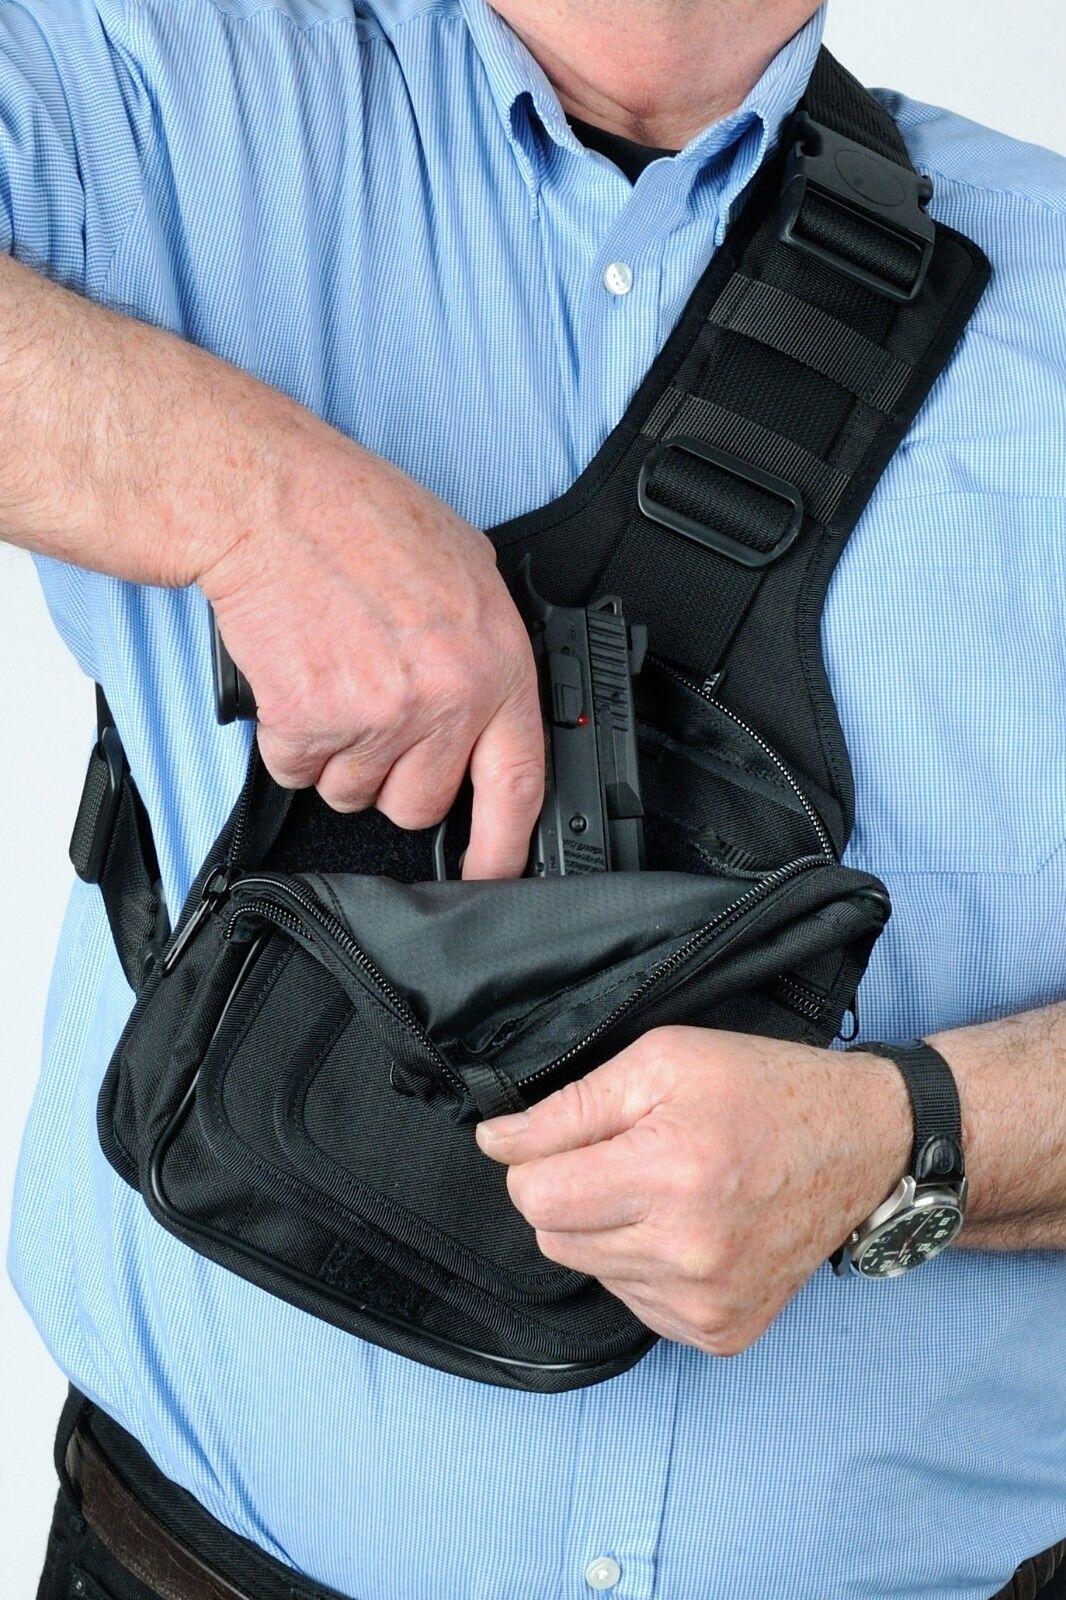 CZ 75 pistolas Premium Cruz Concealed Carry brazos Estuche Case-dibujo rápido